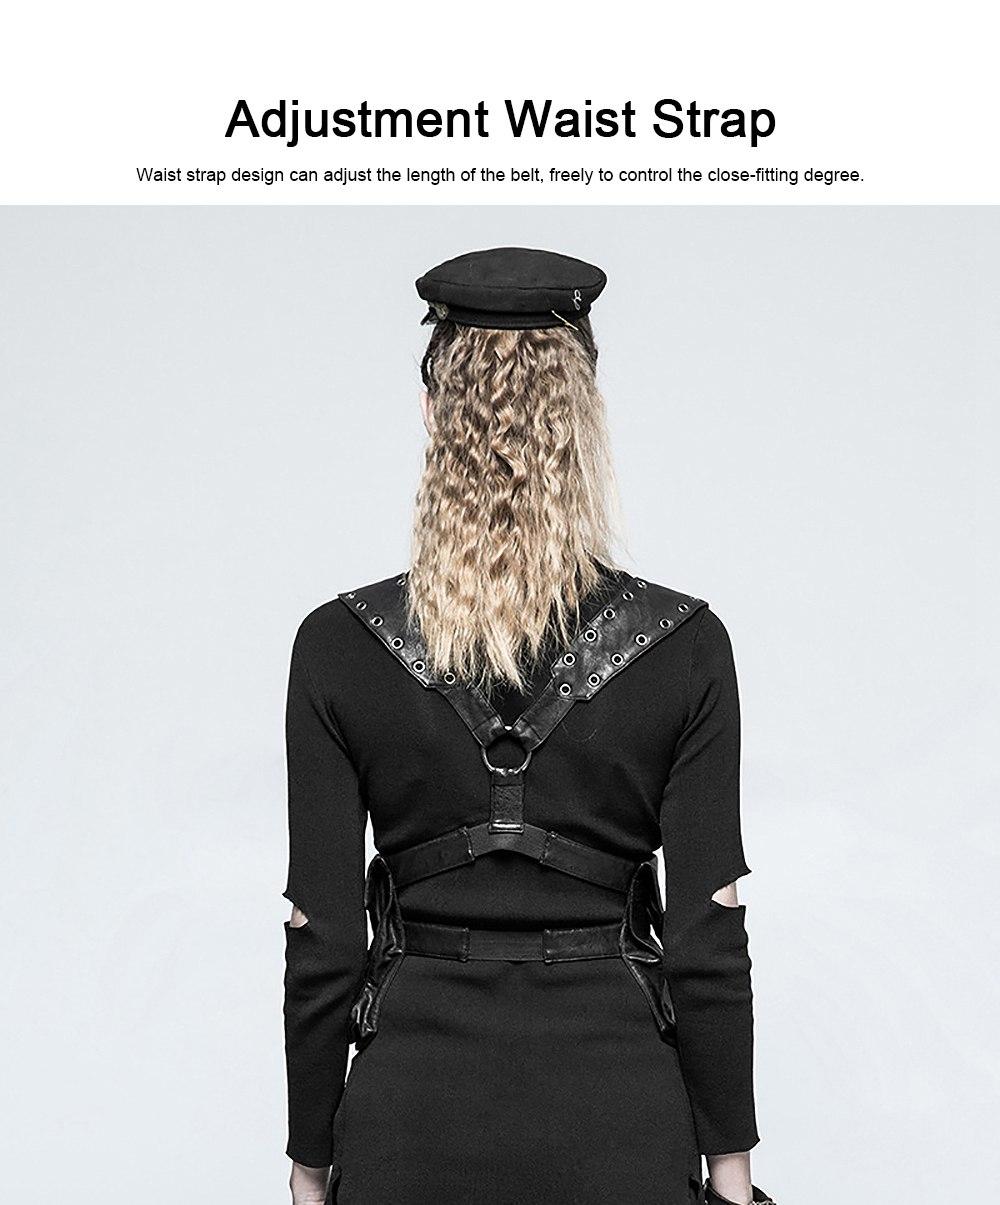 Square Shape Waist Strap Adjustable Belt Backpack, Locomotive Style Bag for Women, PU Leather Waistcoat Halloween Gift 4